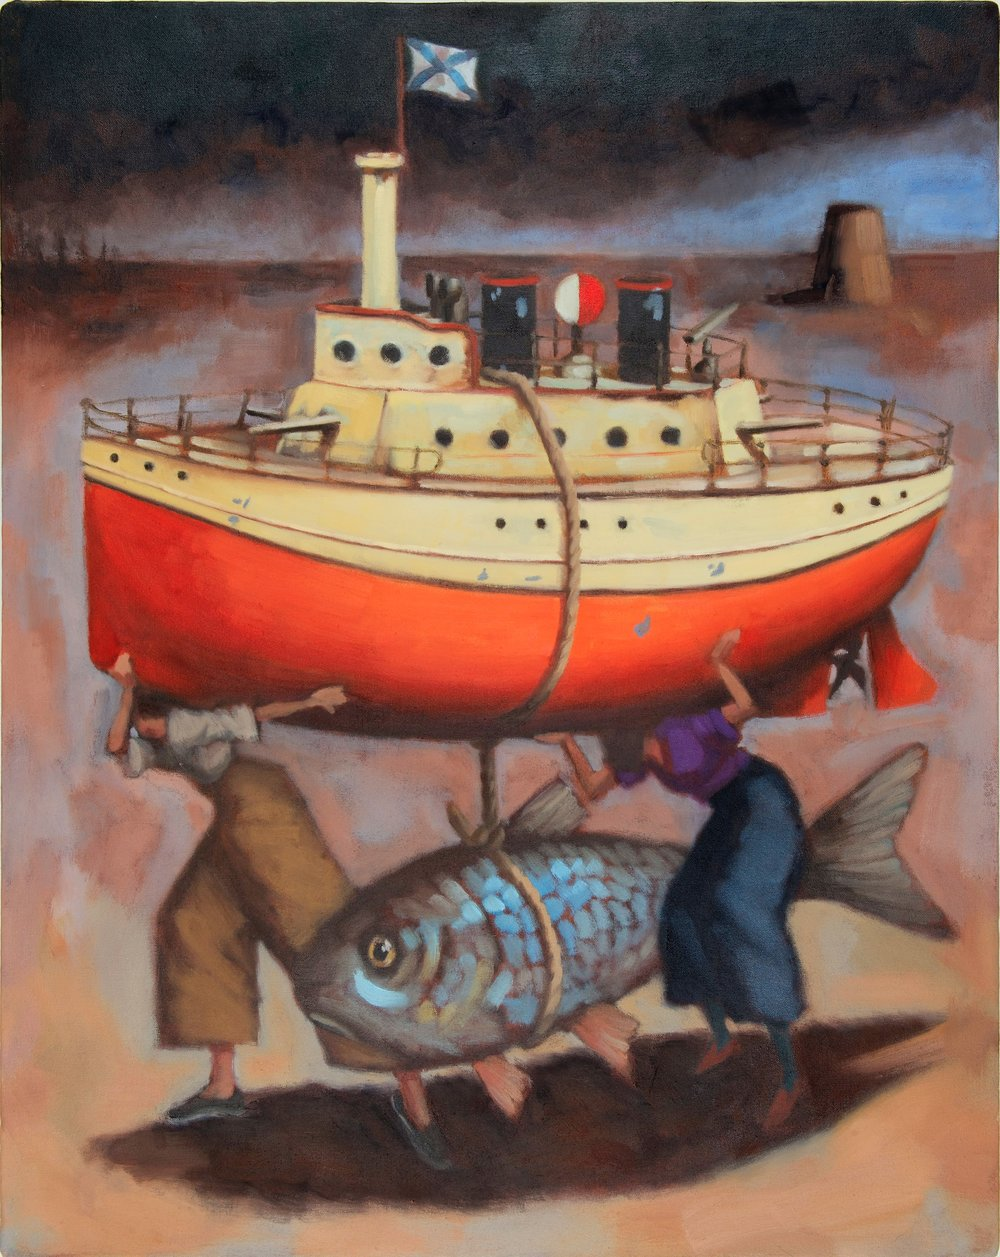 Steve Fricker : Aqua, 80 cm x 65 cm, oil on canvas